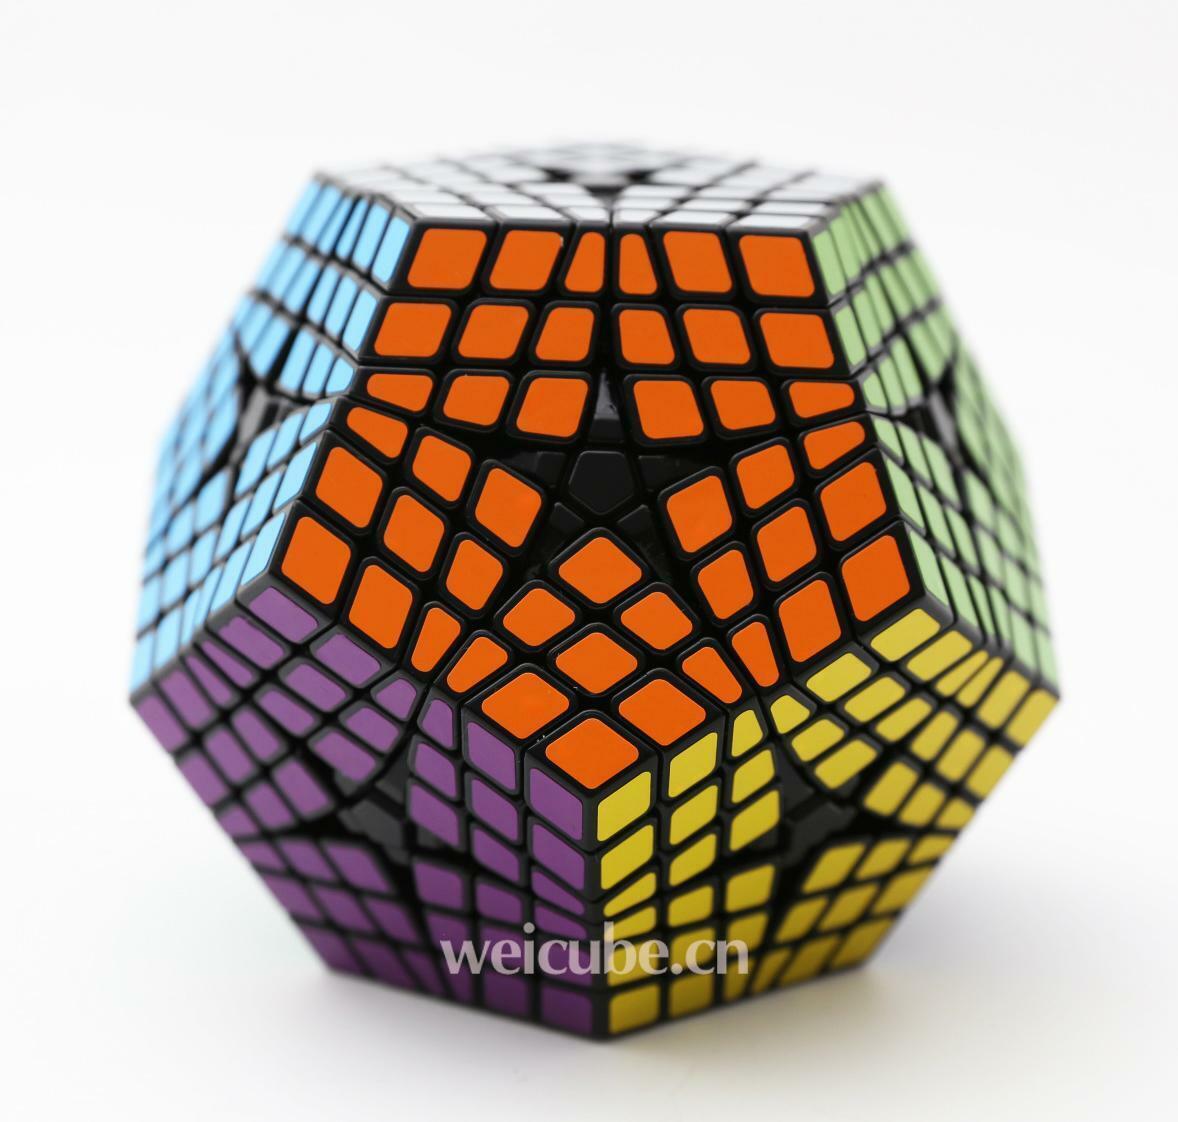 New ShengShou 6x6x6 Megaminx Teraminx Twist Puzzle Magic Cube Intellectual toys